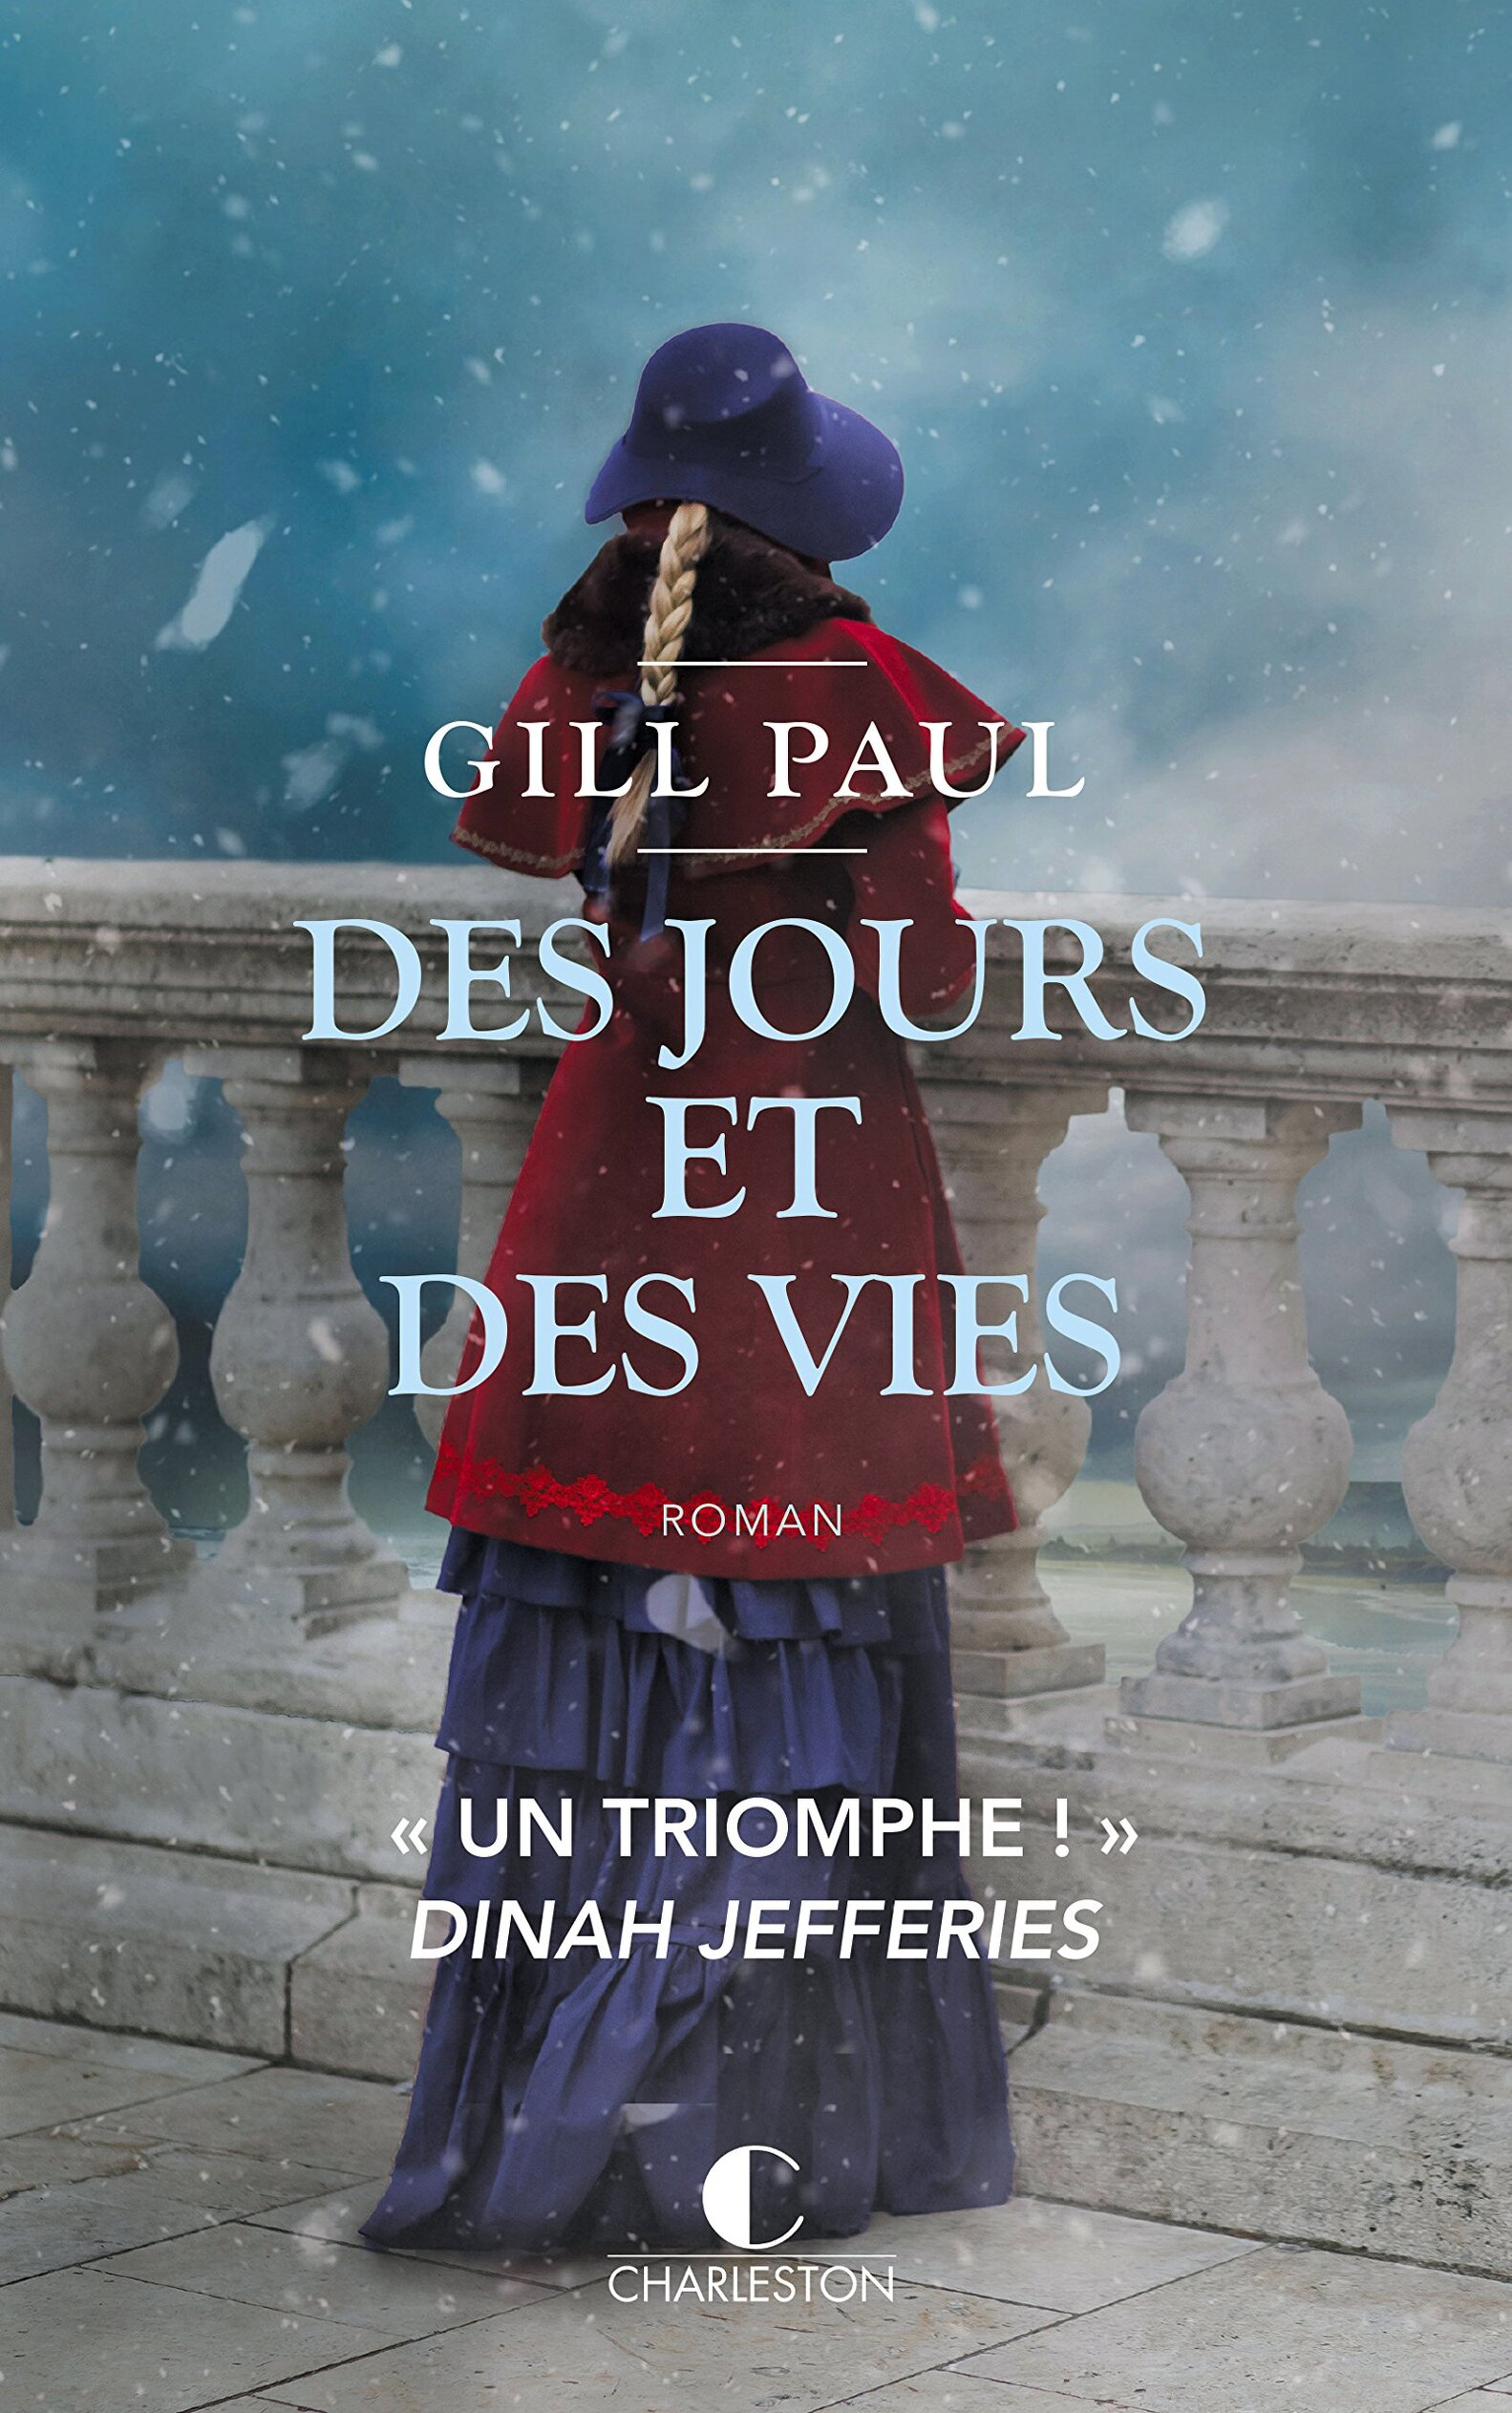 cdn1.booknode.com/book_cover/1071/full/des-jours-et-des-vies-1071110.jpg